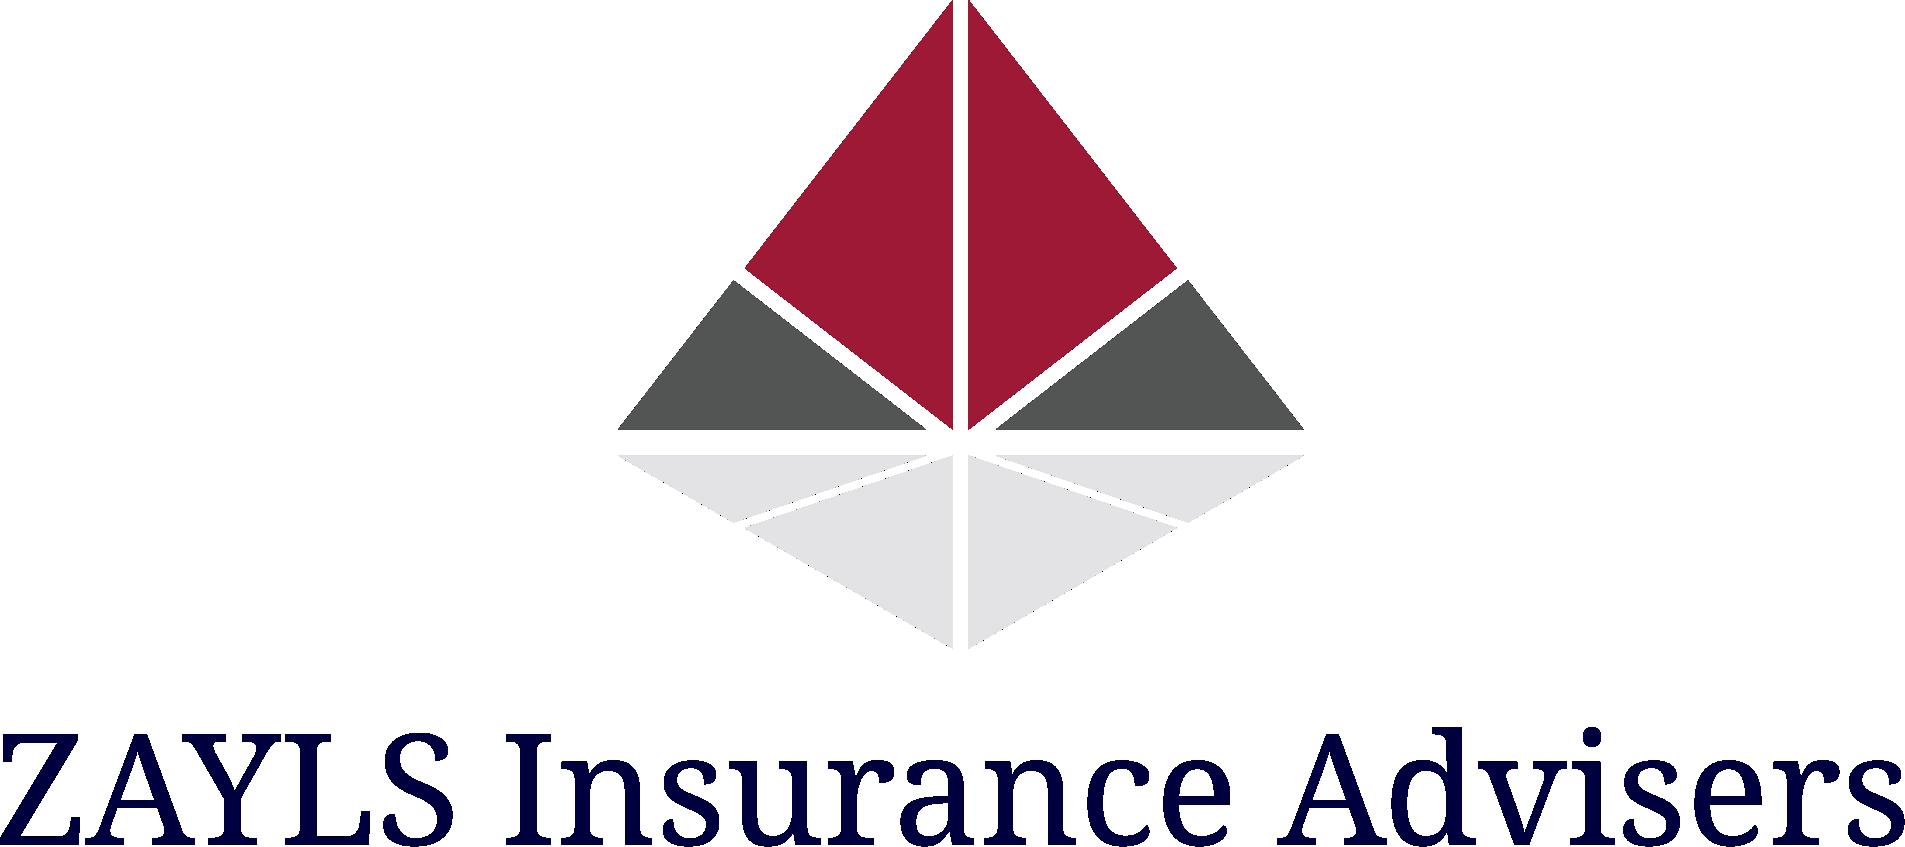 ZAYLS Insurance Advisors